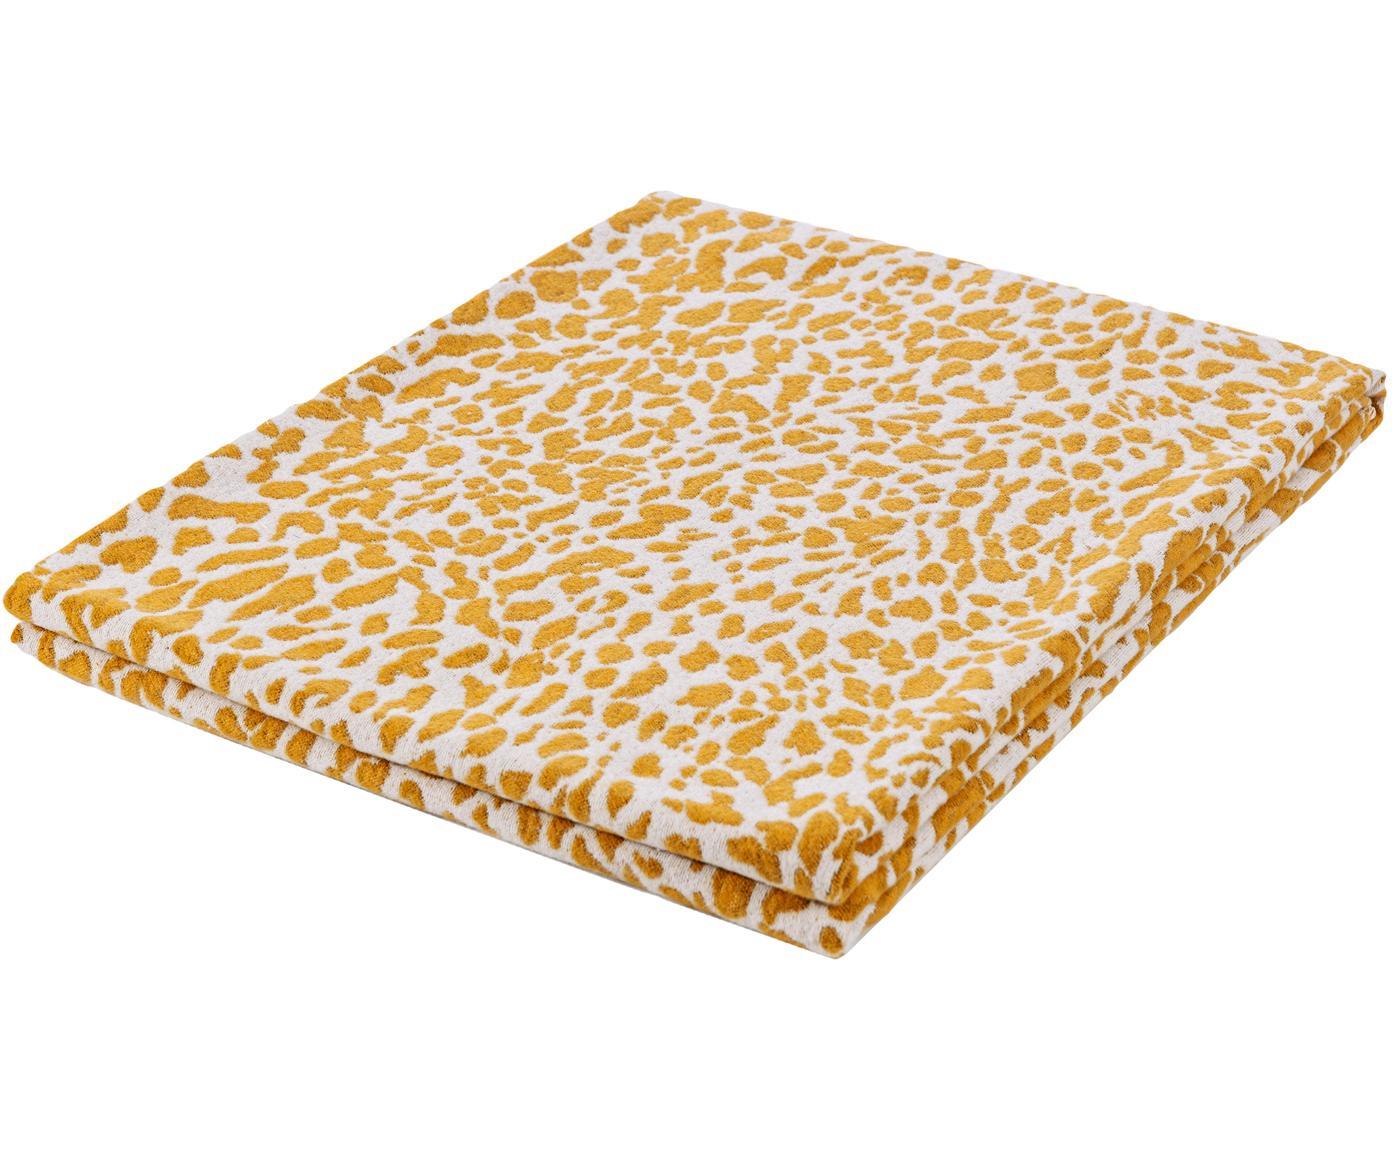 Plaid Leopardo mit gelb/weißem Muster, Webart: Jacquard, Senfgelb, Weiß, 140 x 180 cm